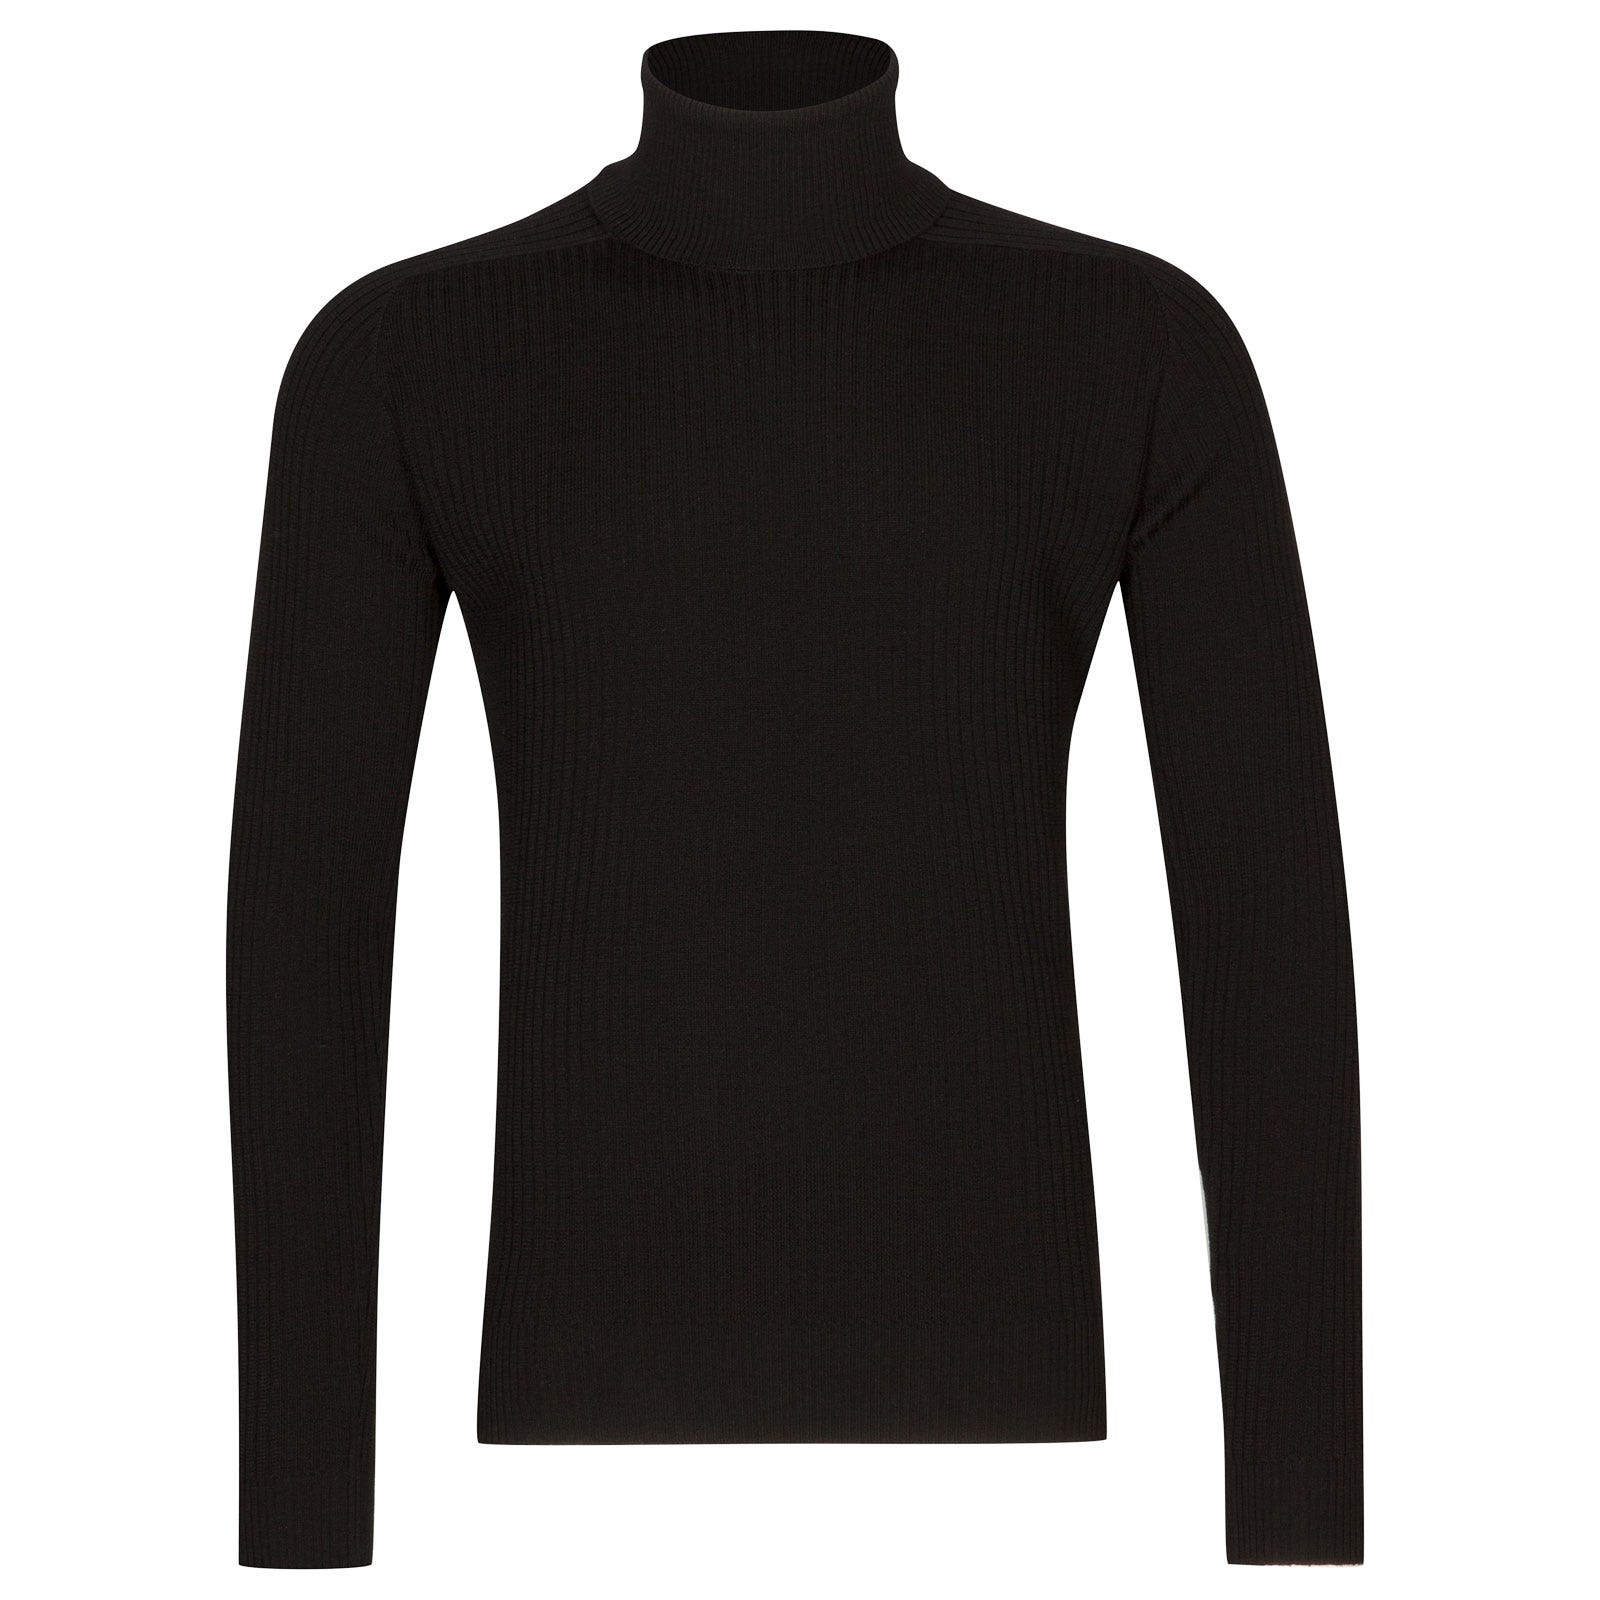 John Smedley redmayne Merino Wool Pullover in Black-M